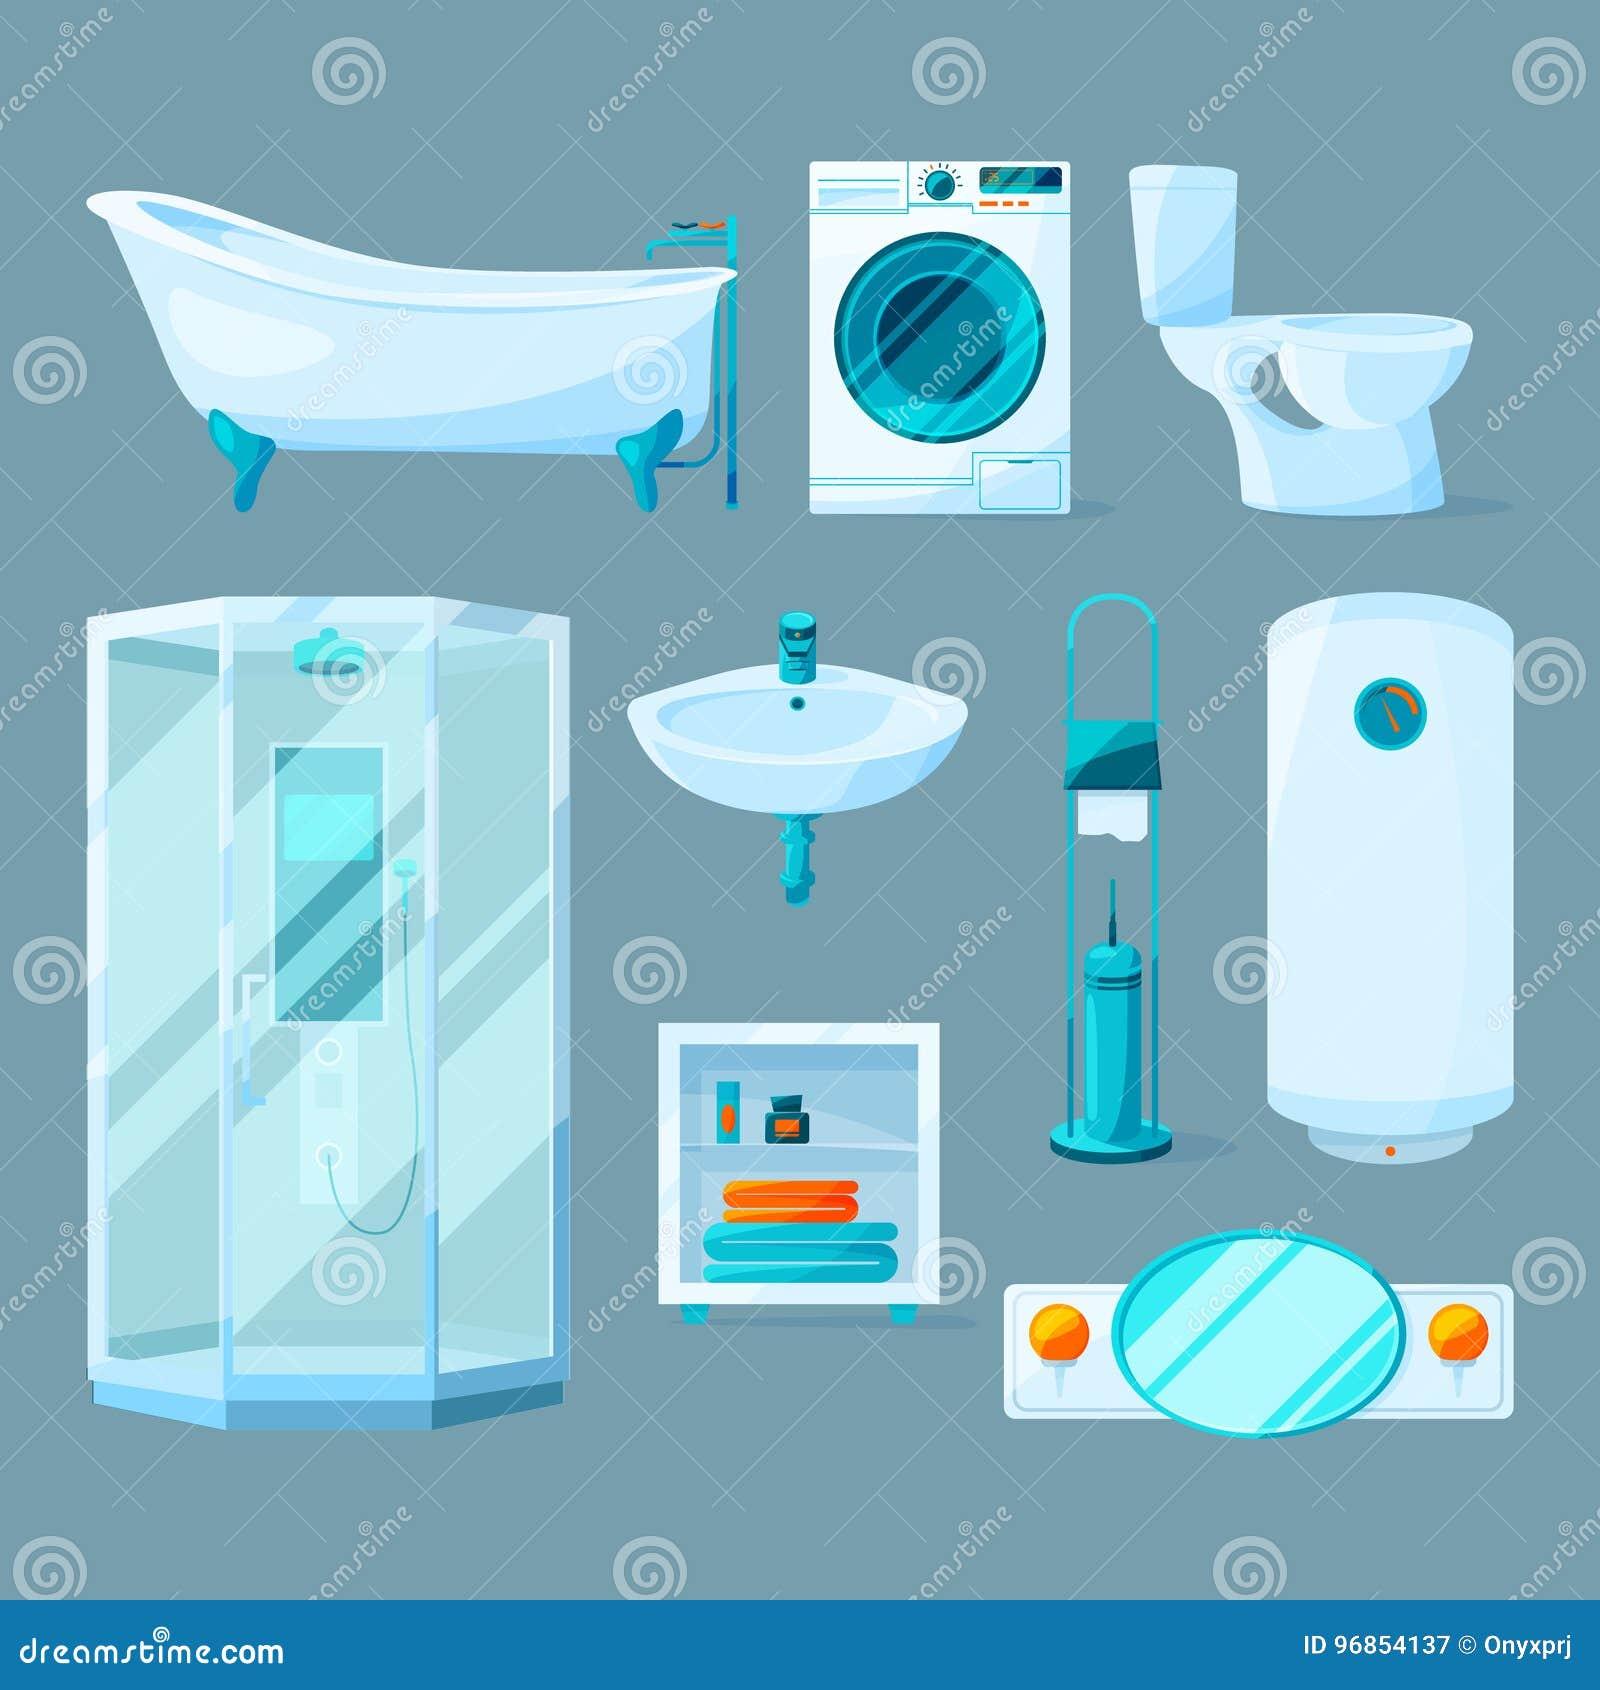 Bathroom Interior Furniture And Different Equipment